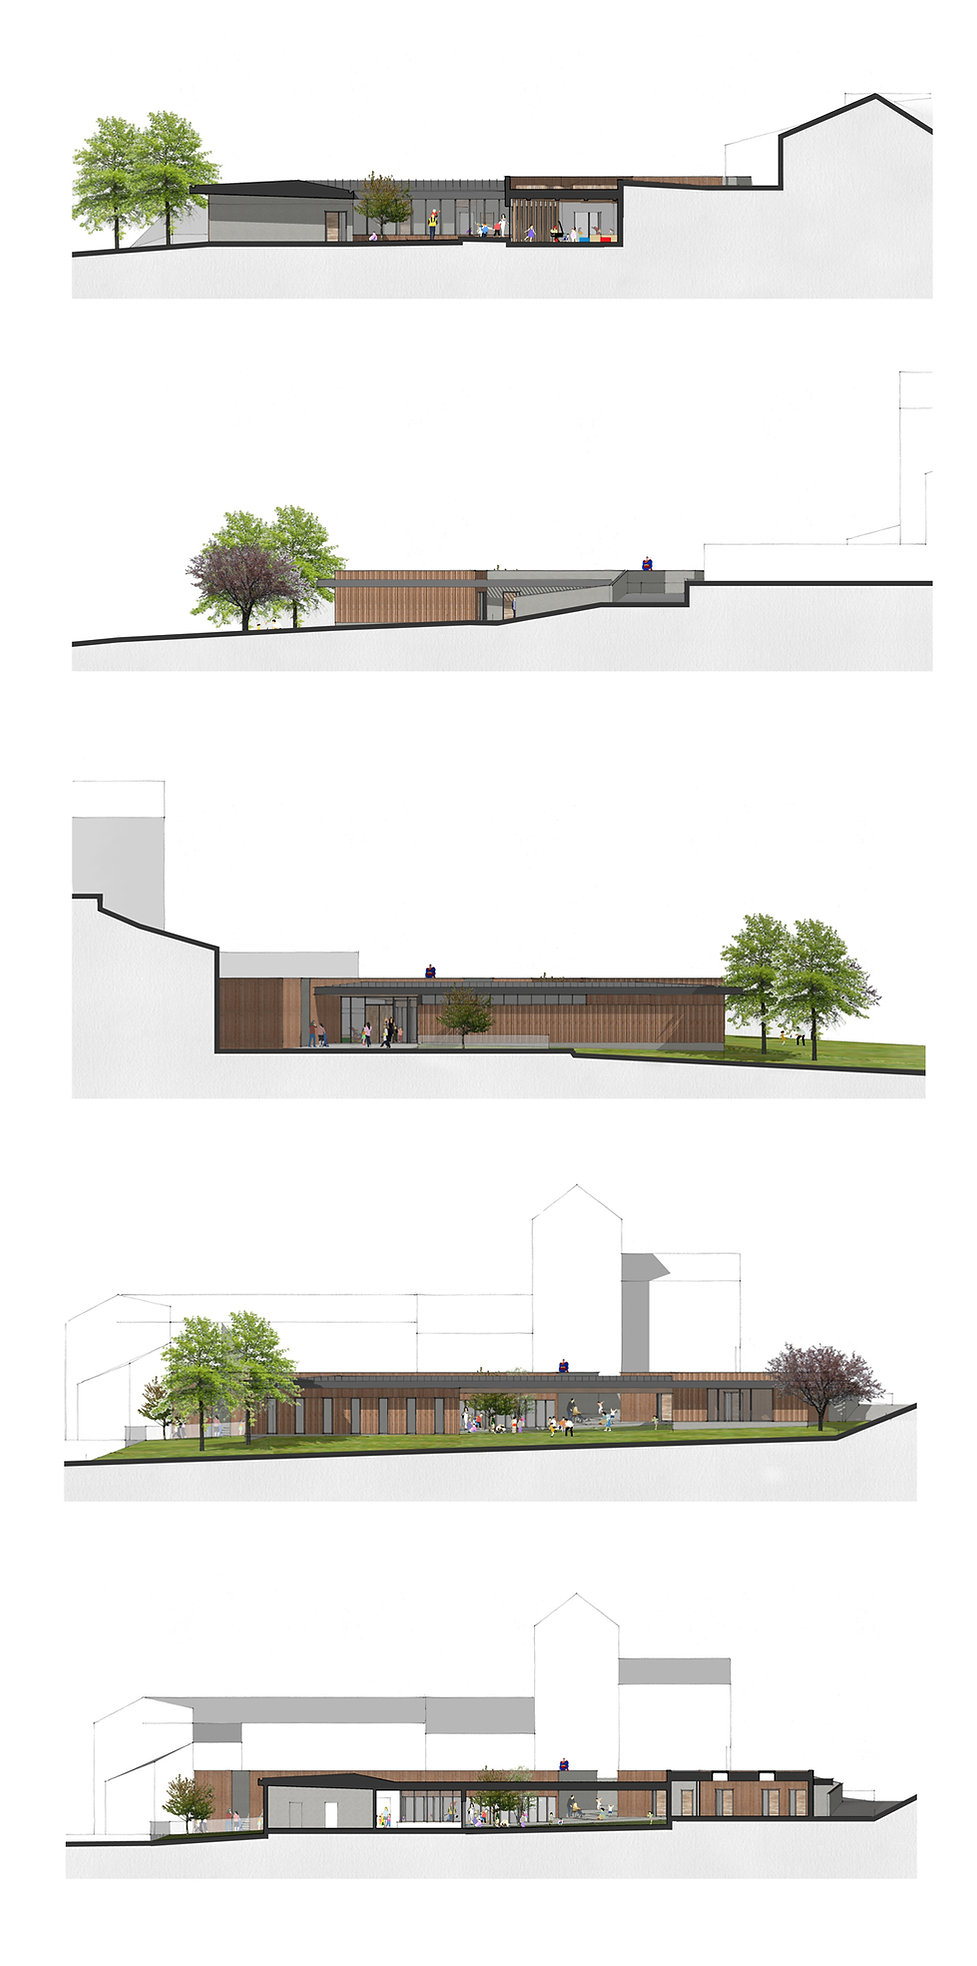 montage facades coupe.jpg